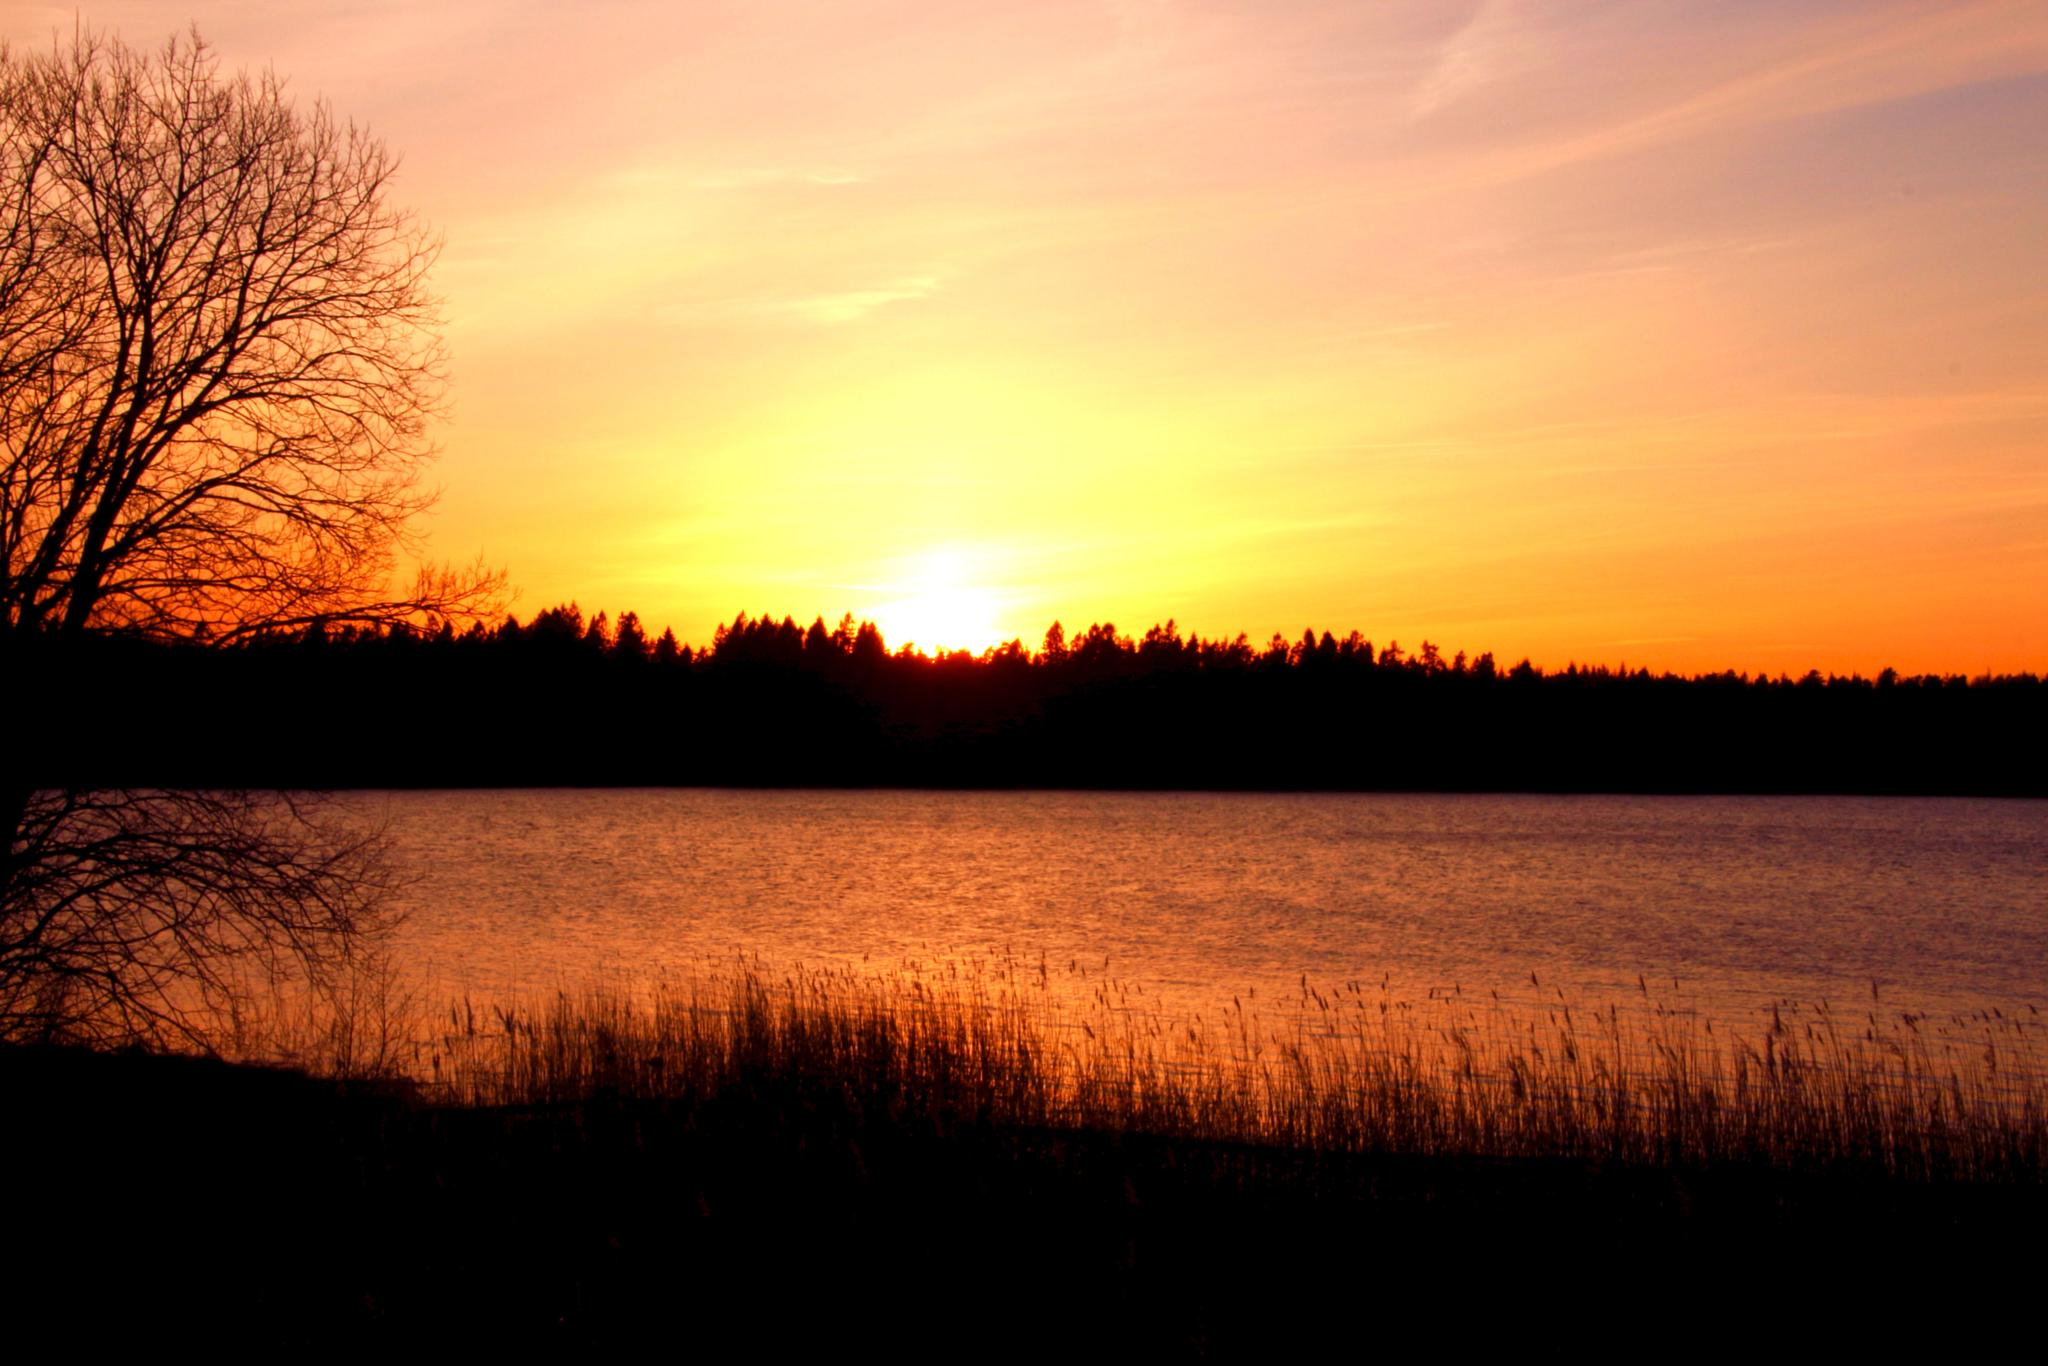 Sun dawn over lake by inge.braberg